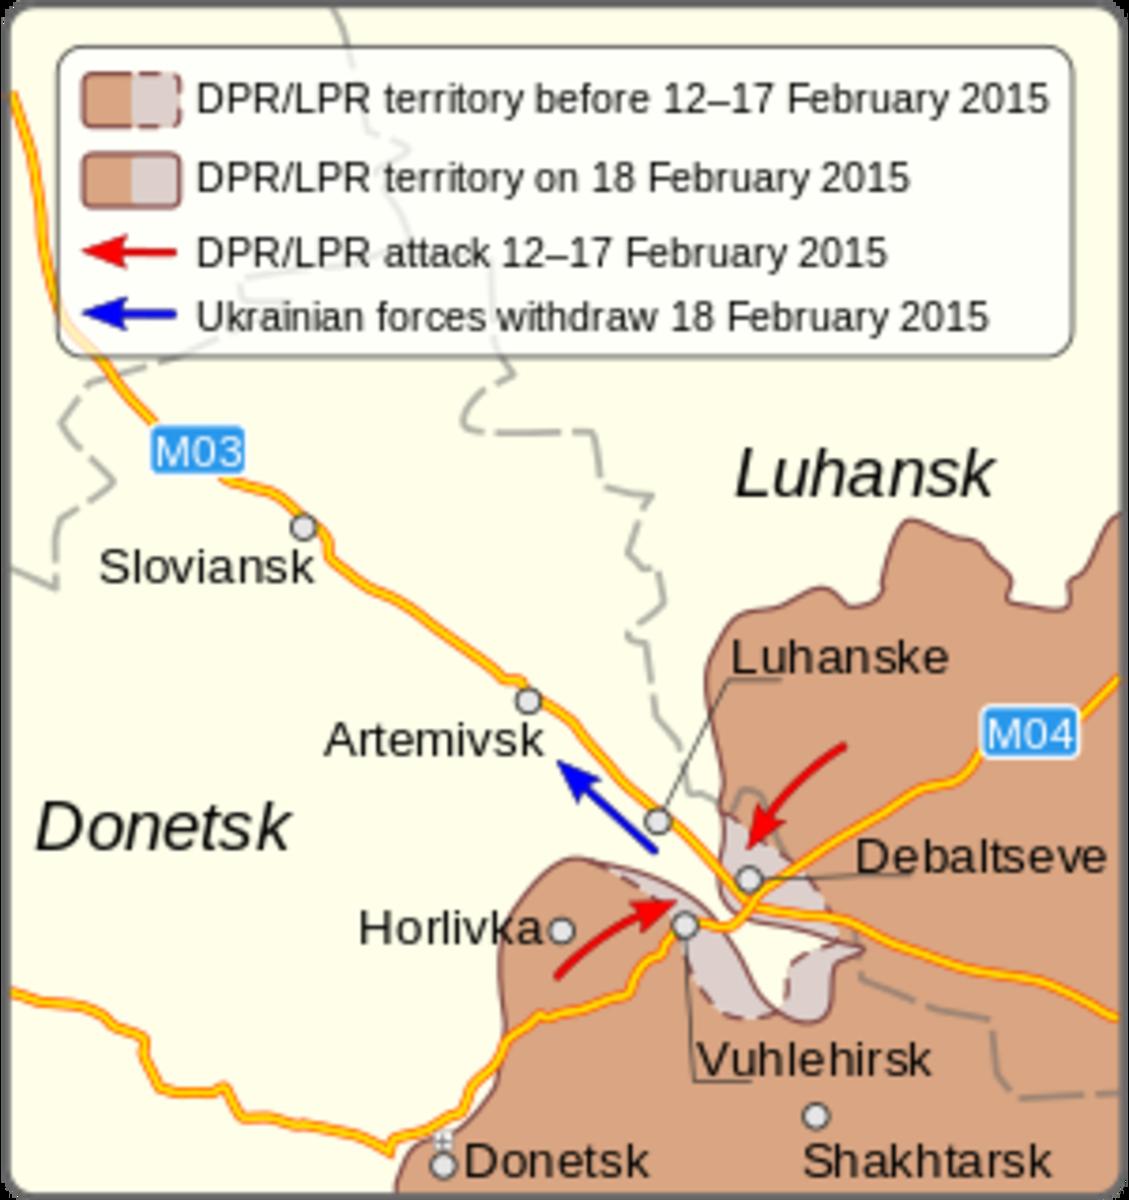 Putin's War and His Little Green Men at Debaltseve, Ukraine, 2015